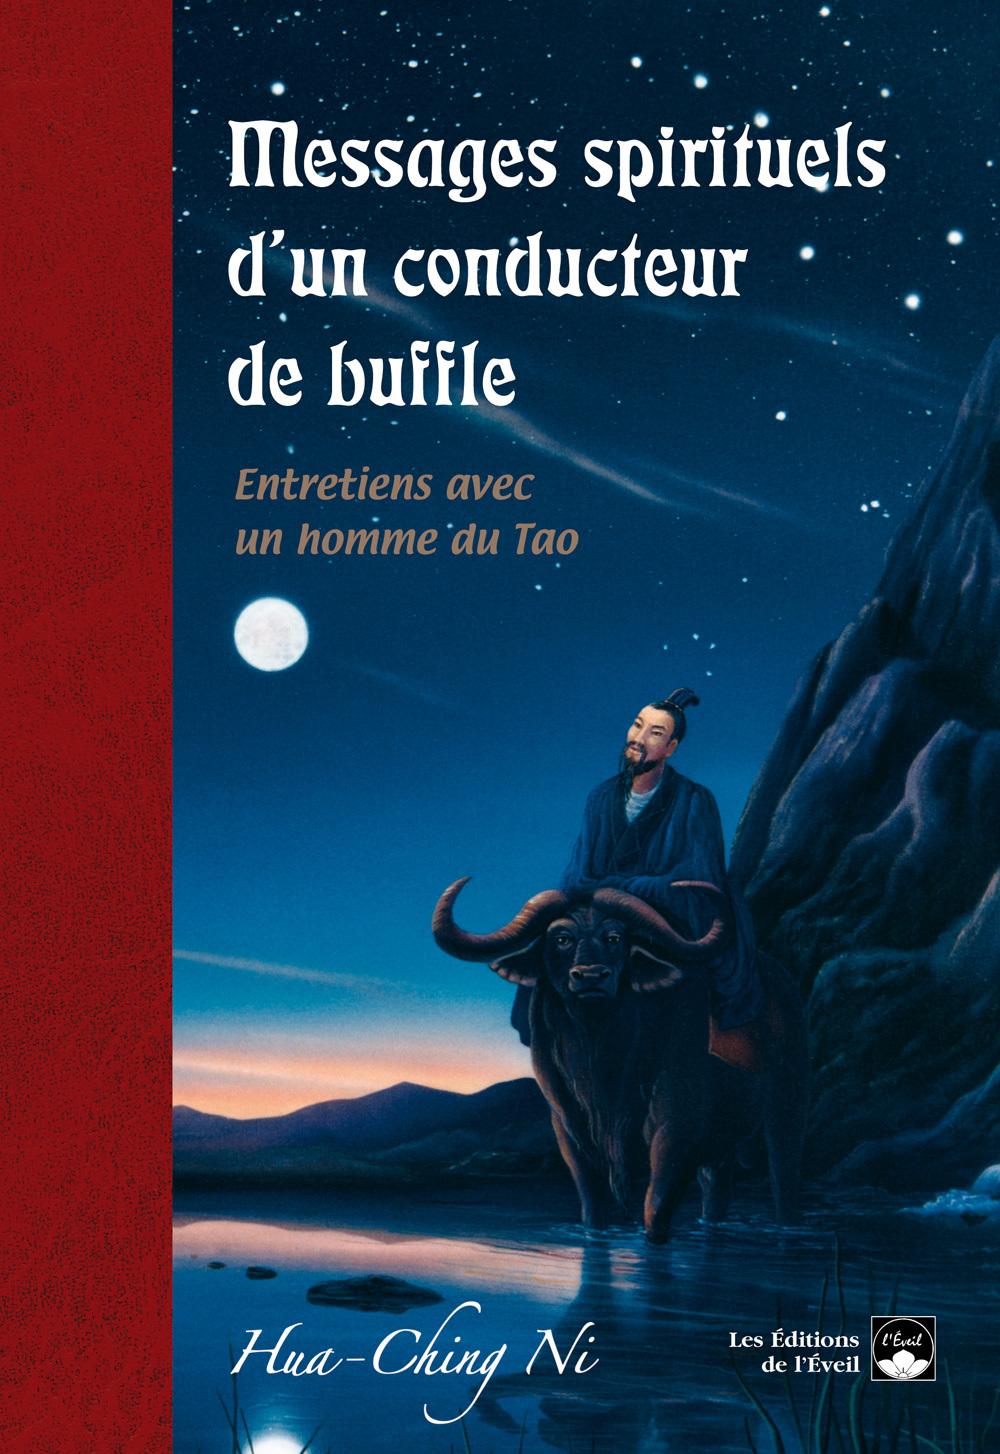 MESSAGES SPIRITUELS D'UN CONDUCTEUR DE BUFFLE